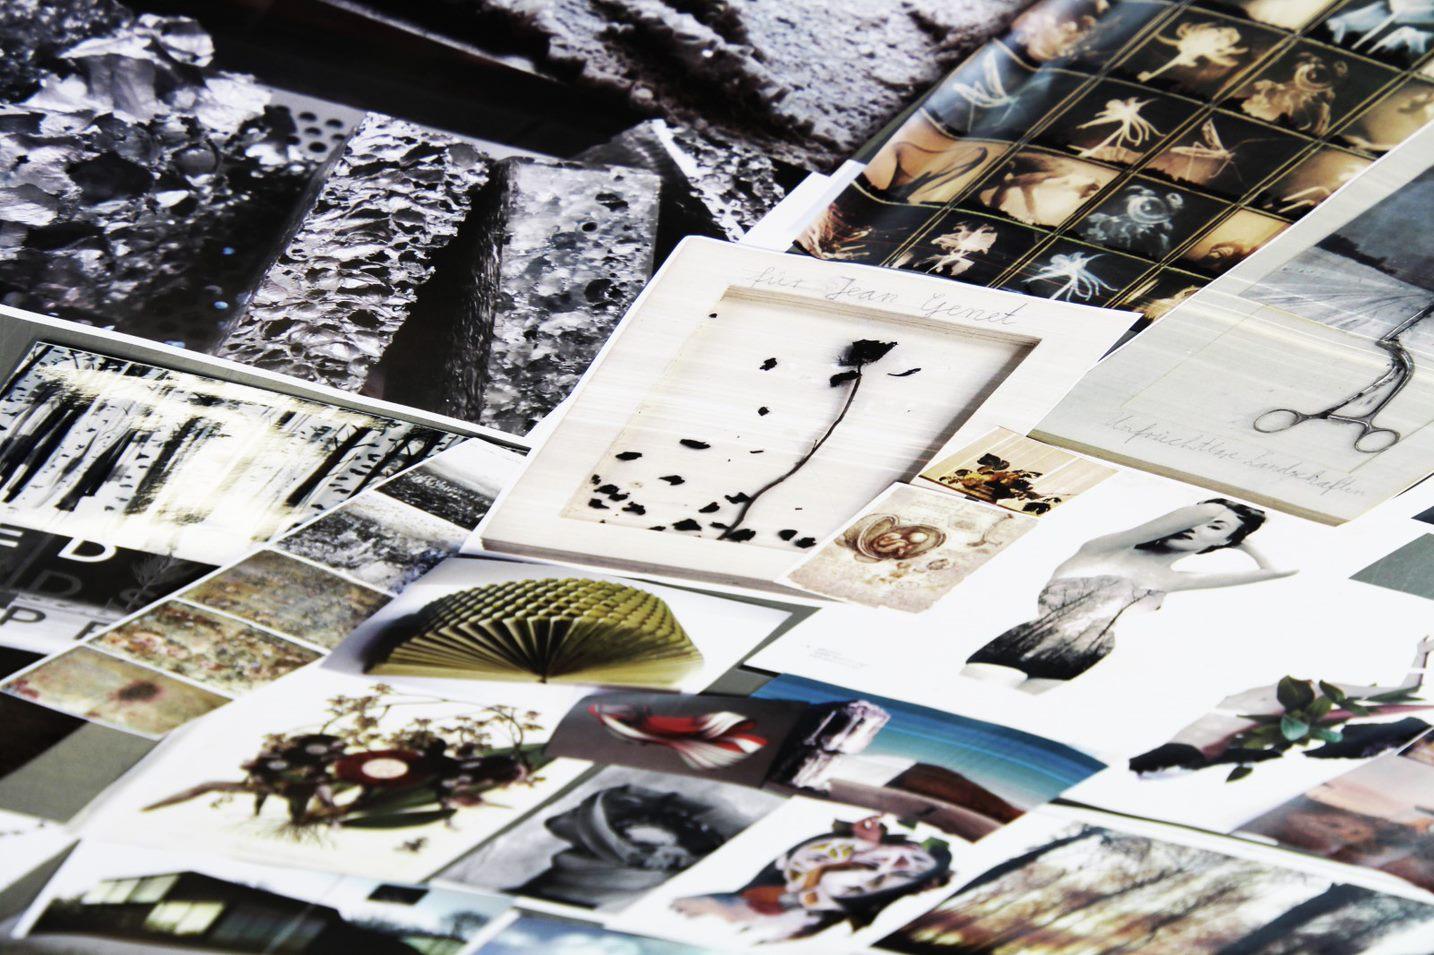 Creating A Fashion Sketchbook